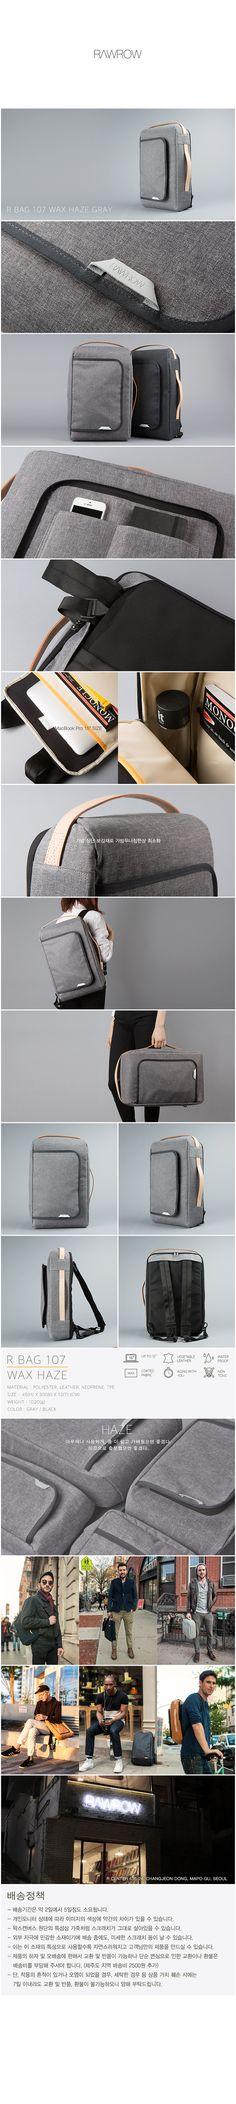 RAWROW - R BAG 107 Wax Gray http://ebagsbackpack.tumblr.com/